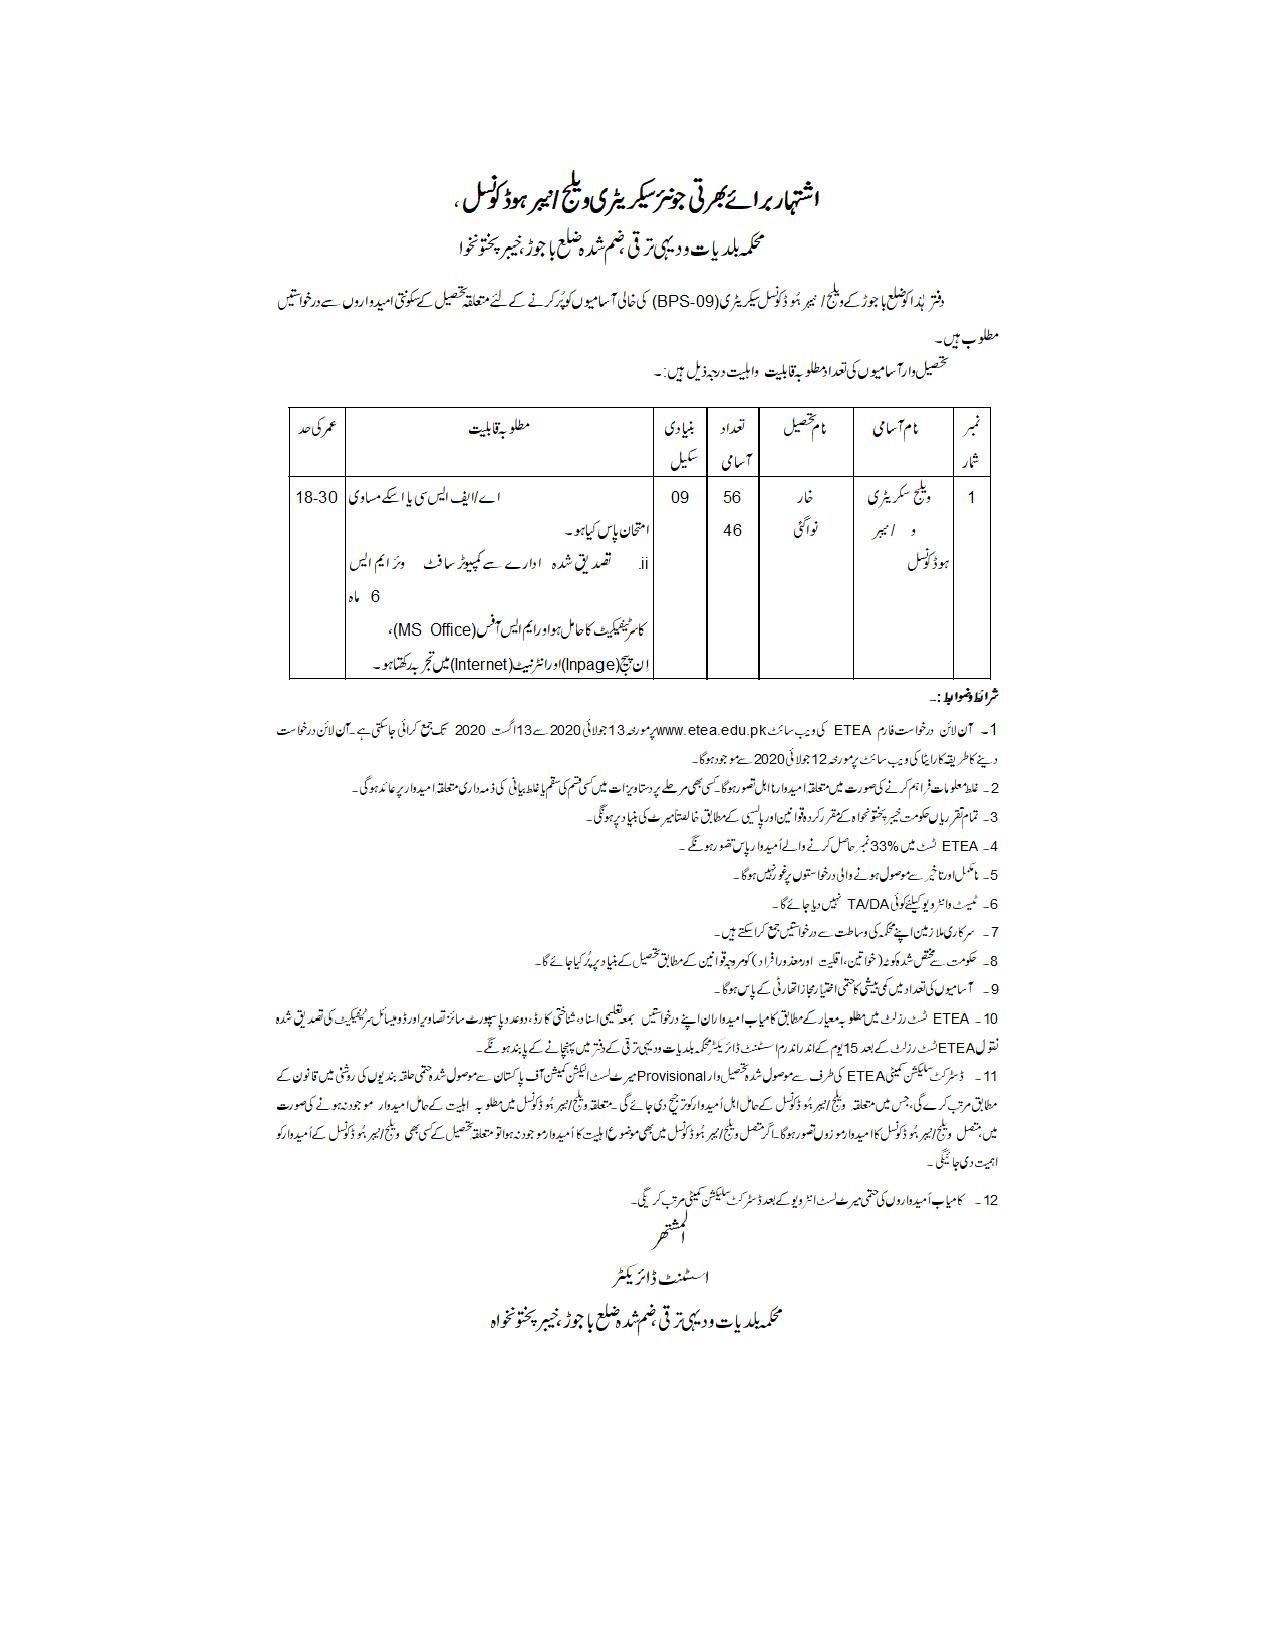 TMA District Orakzai Village secretaries Jobs ETEA Roll No Slip